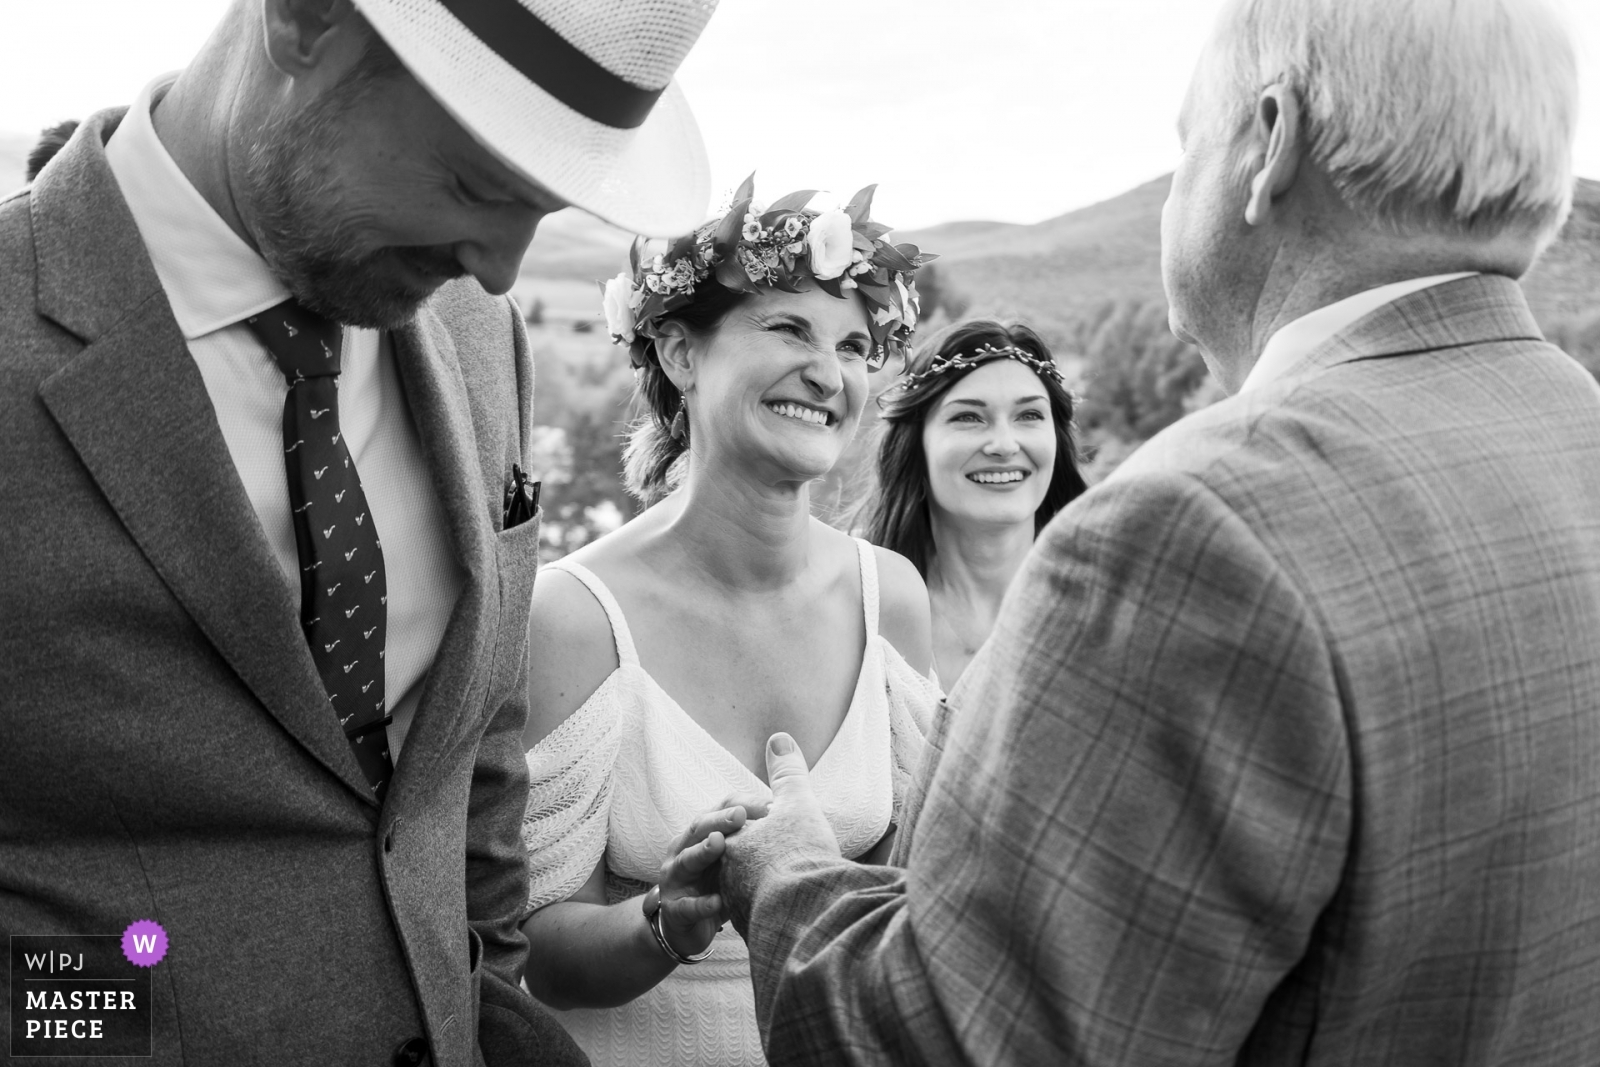 Bride greeting father during ceremony - Denver, Colorado Wedding Photography -  | Grandby, CO